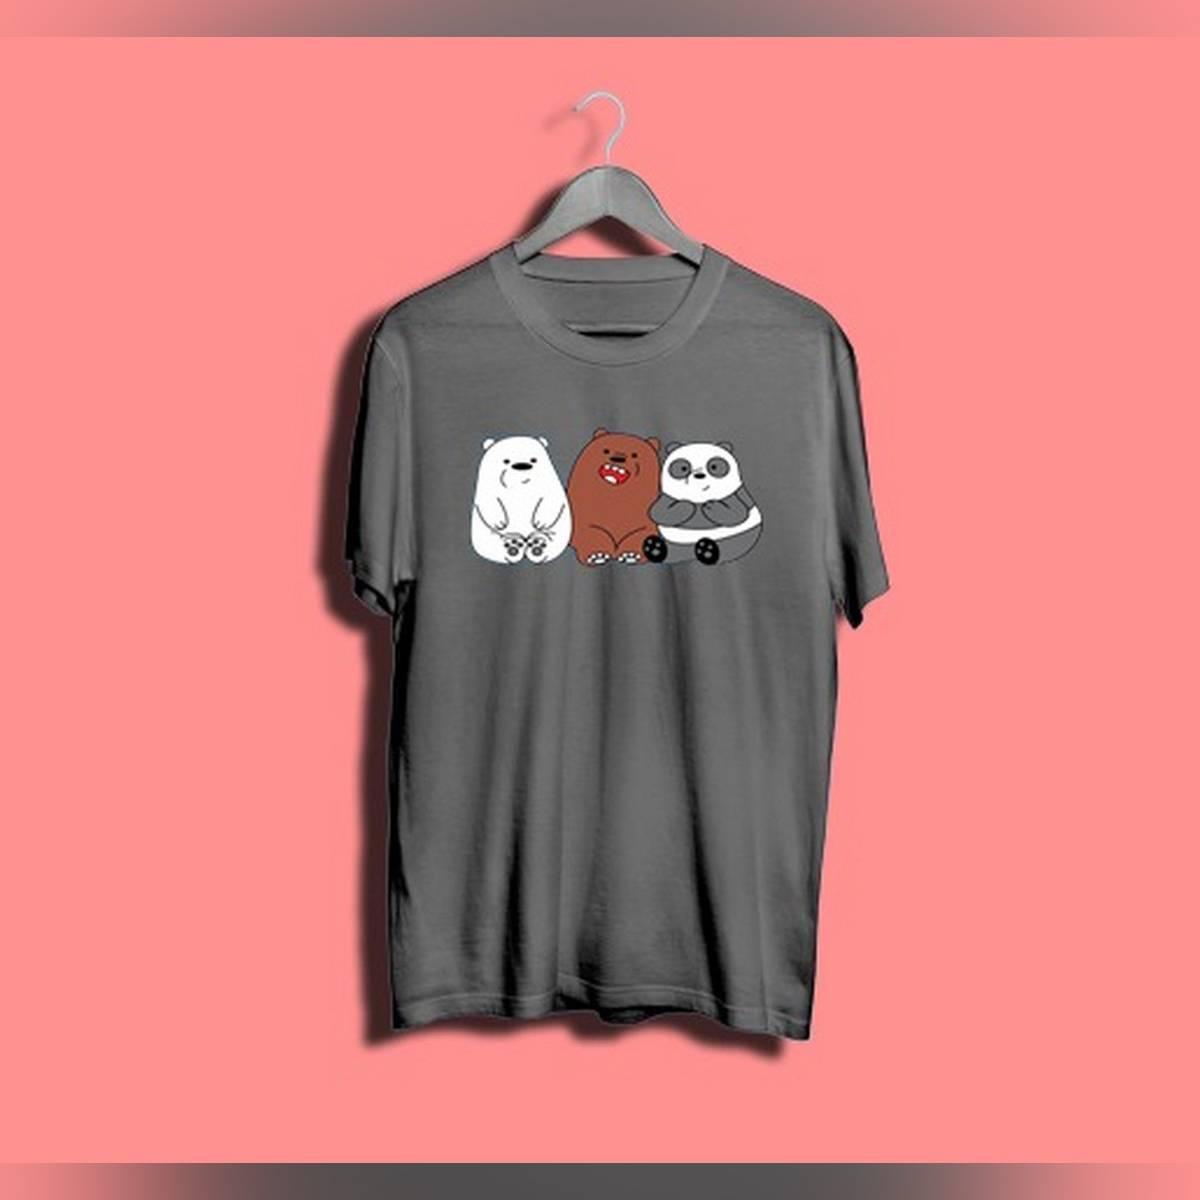 Three Bear Printed T Shirt For Girls